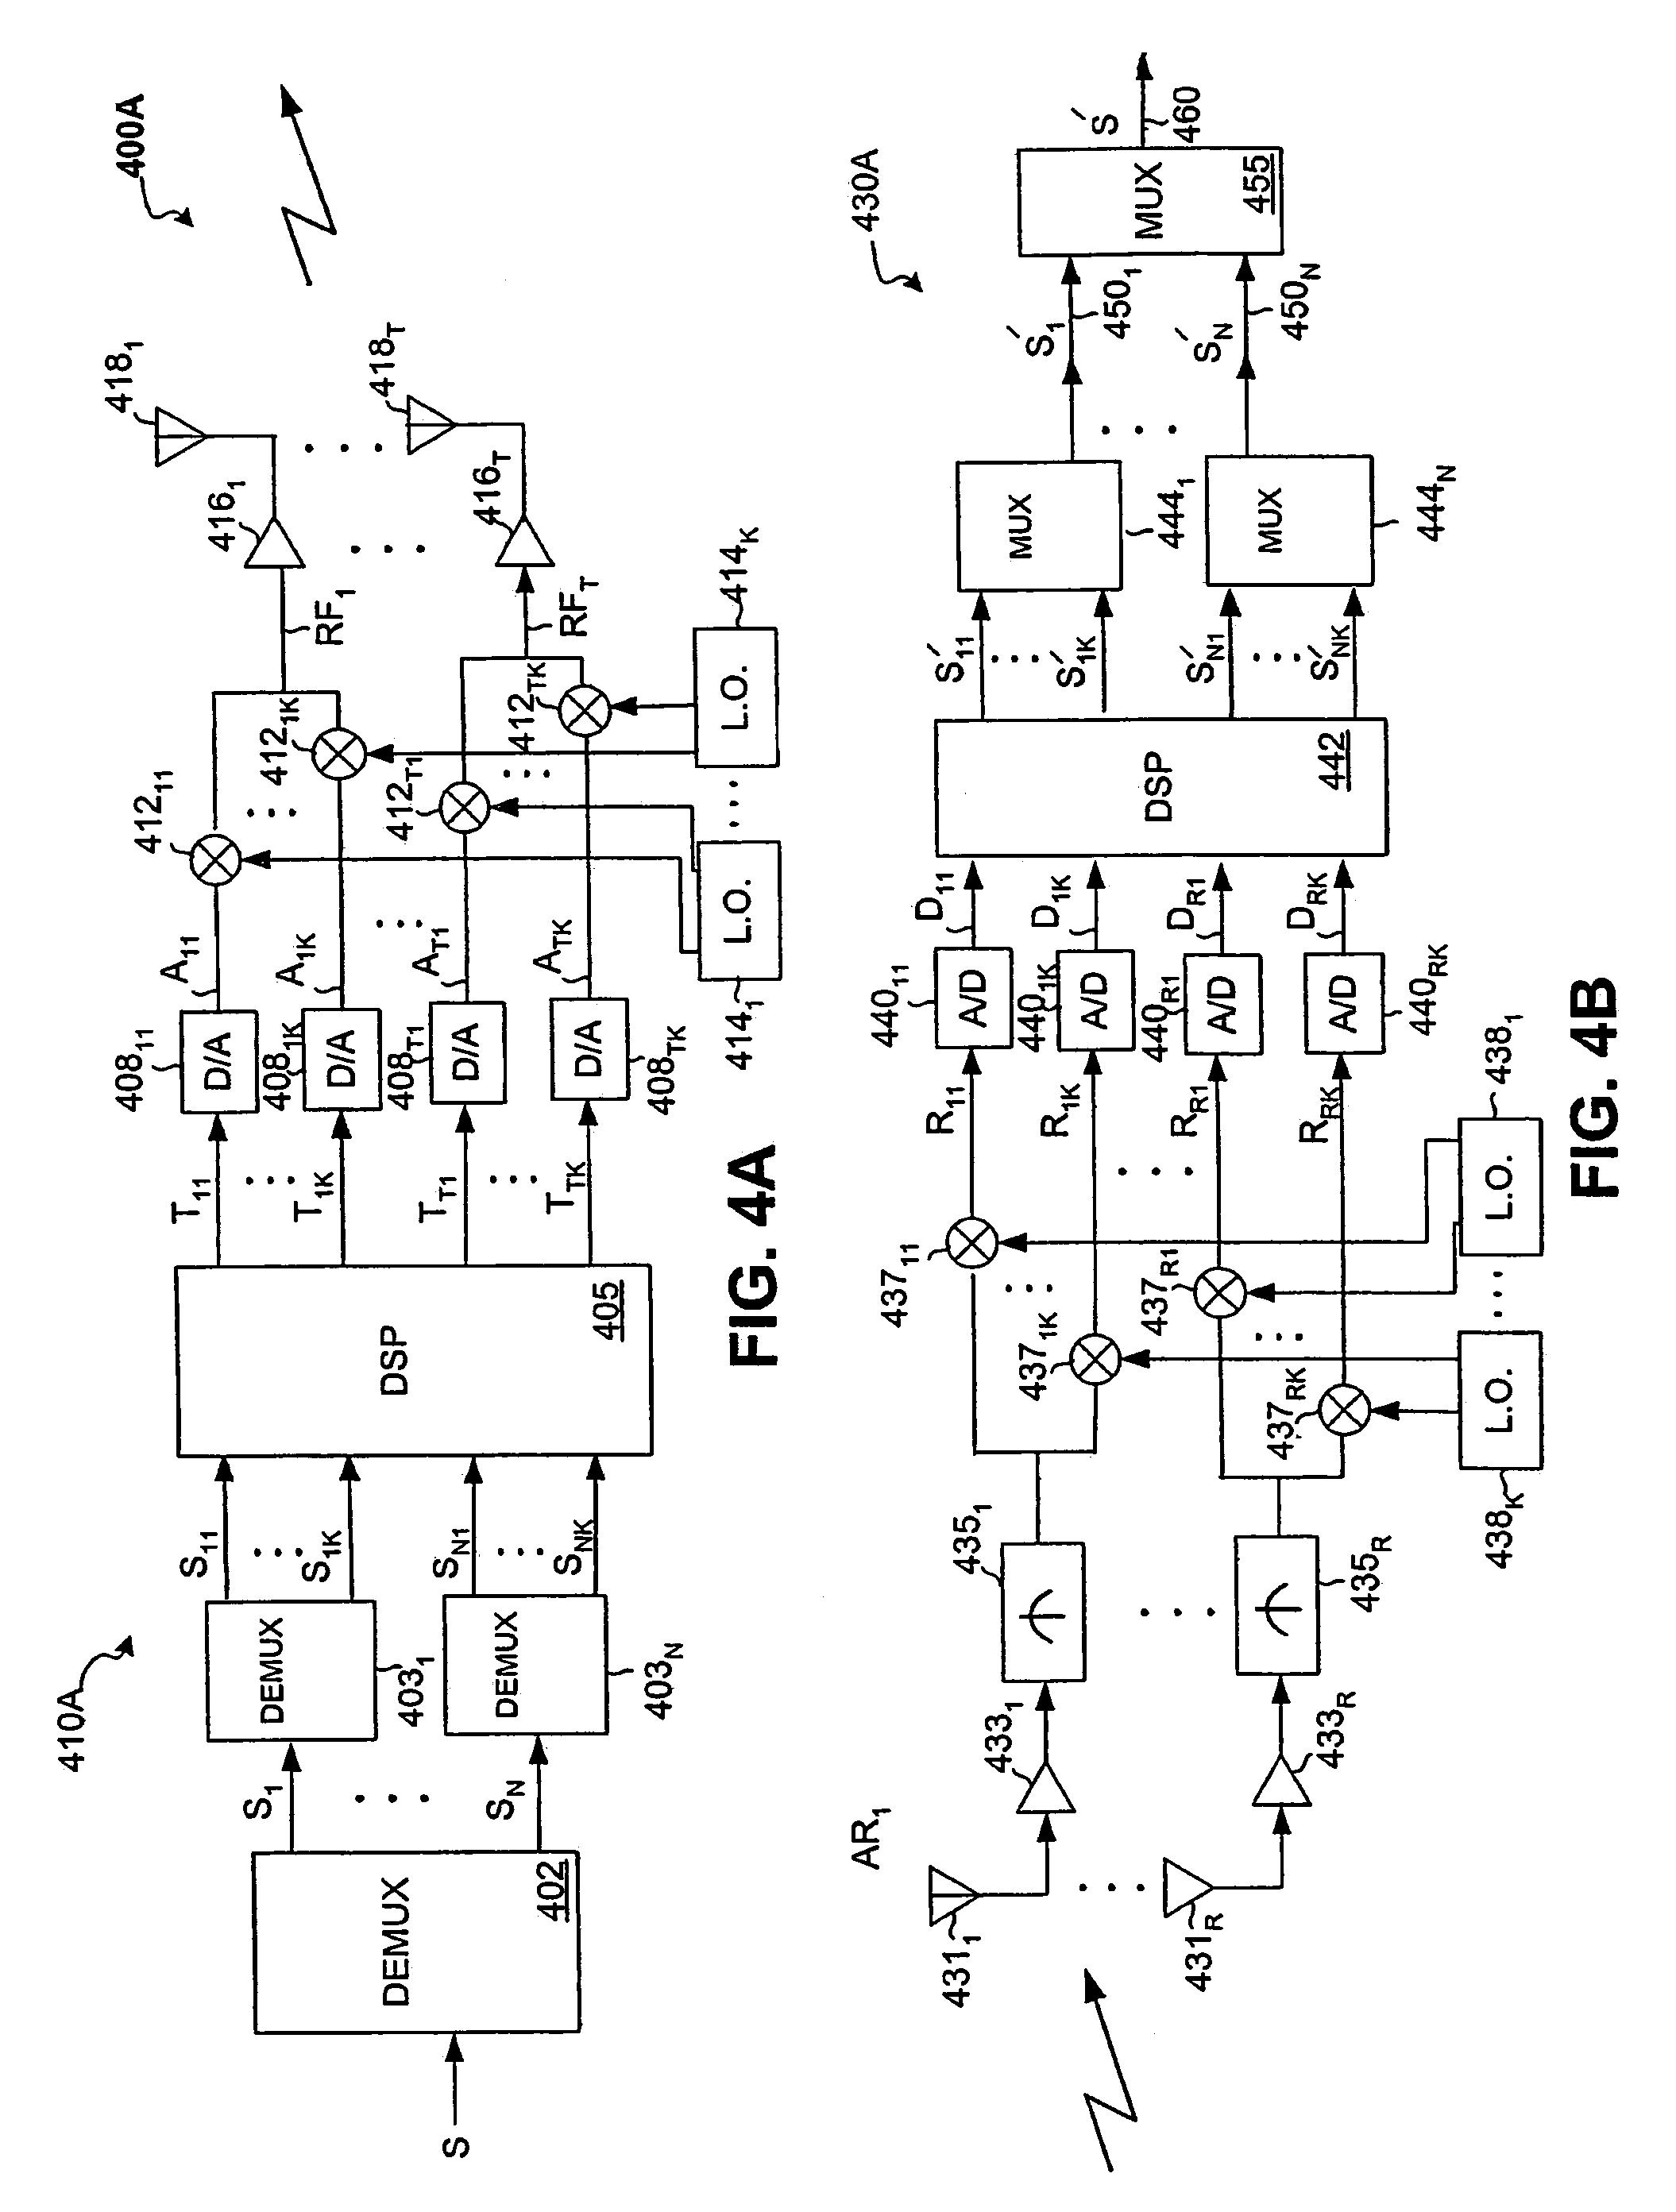 t1 66 block wiring diagram wiring diagram database Terminal Block Mounting Channels patent us 7 391 832 b2 terminal block wiring diagram patent